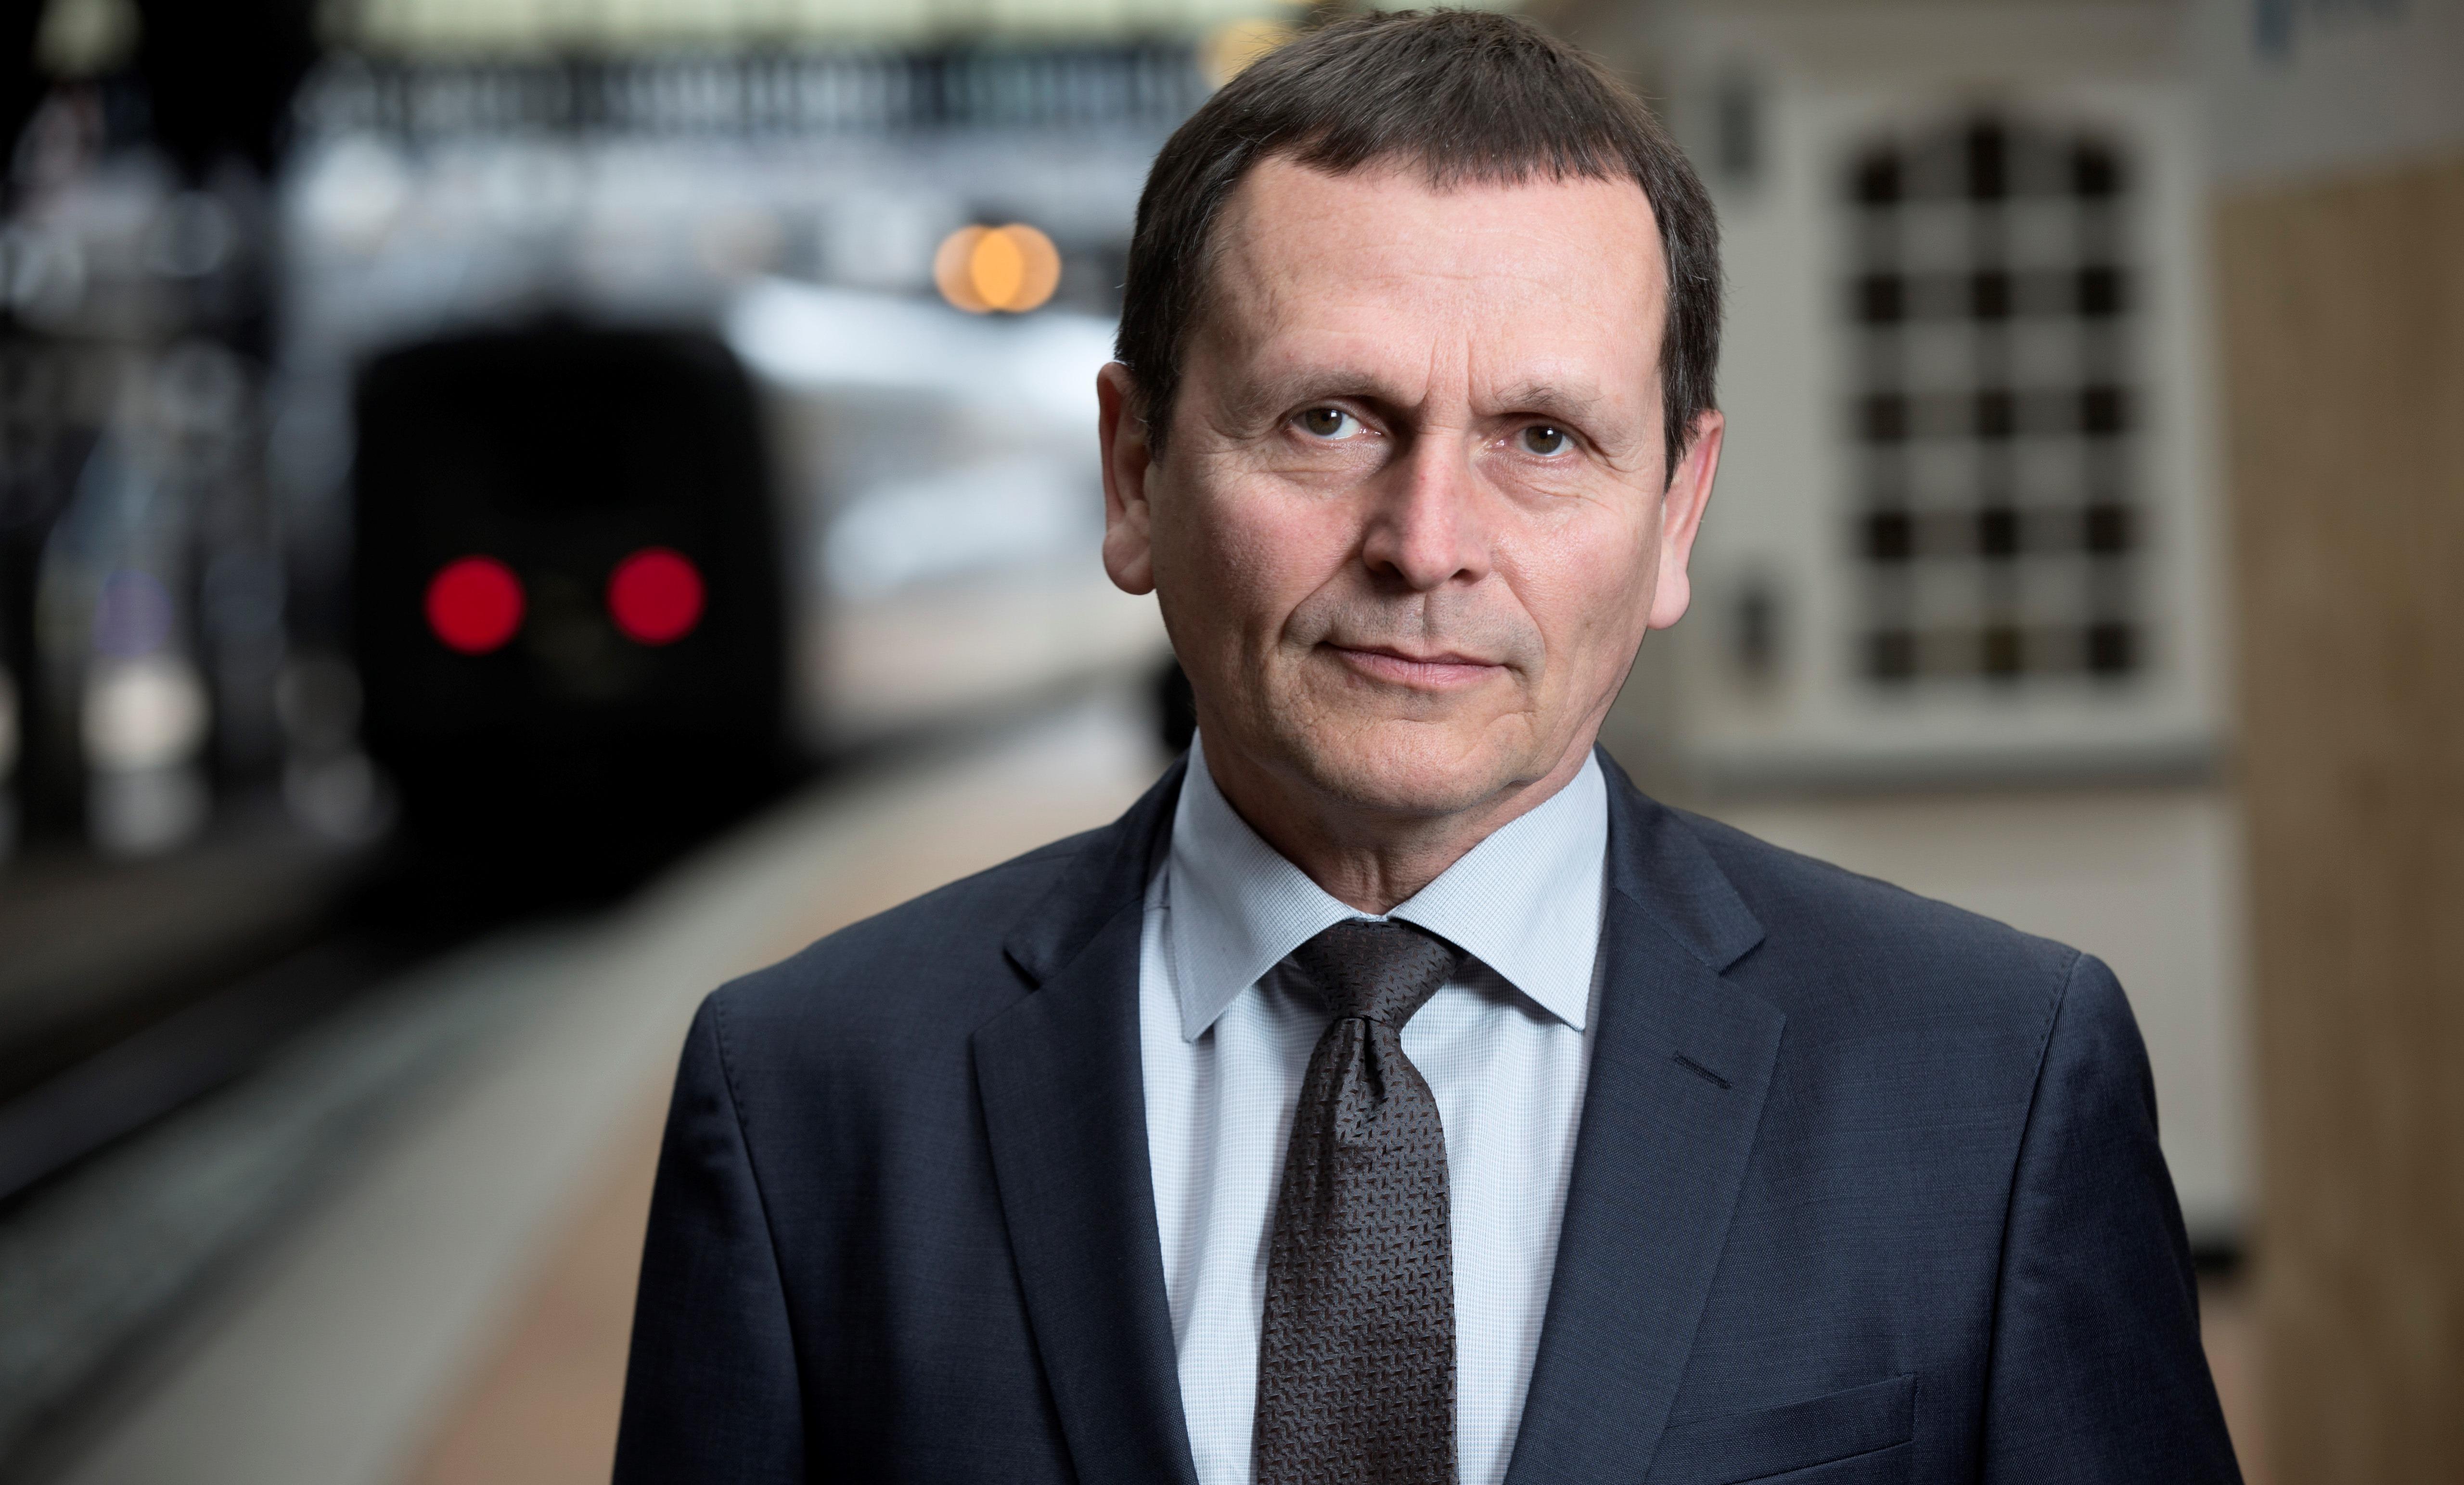 Adm. direktør Flemming Jensen, DSB (Foto: Klaus Holsting)